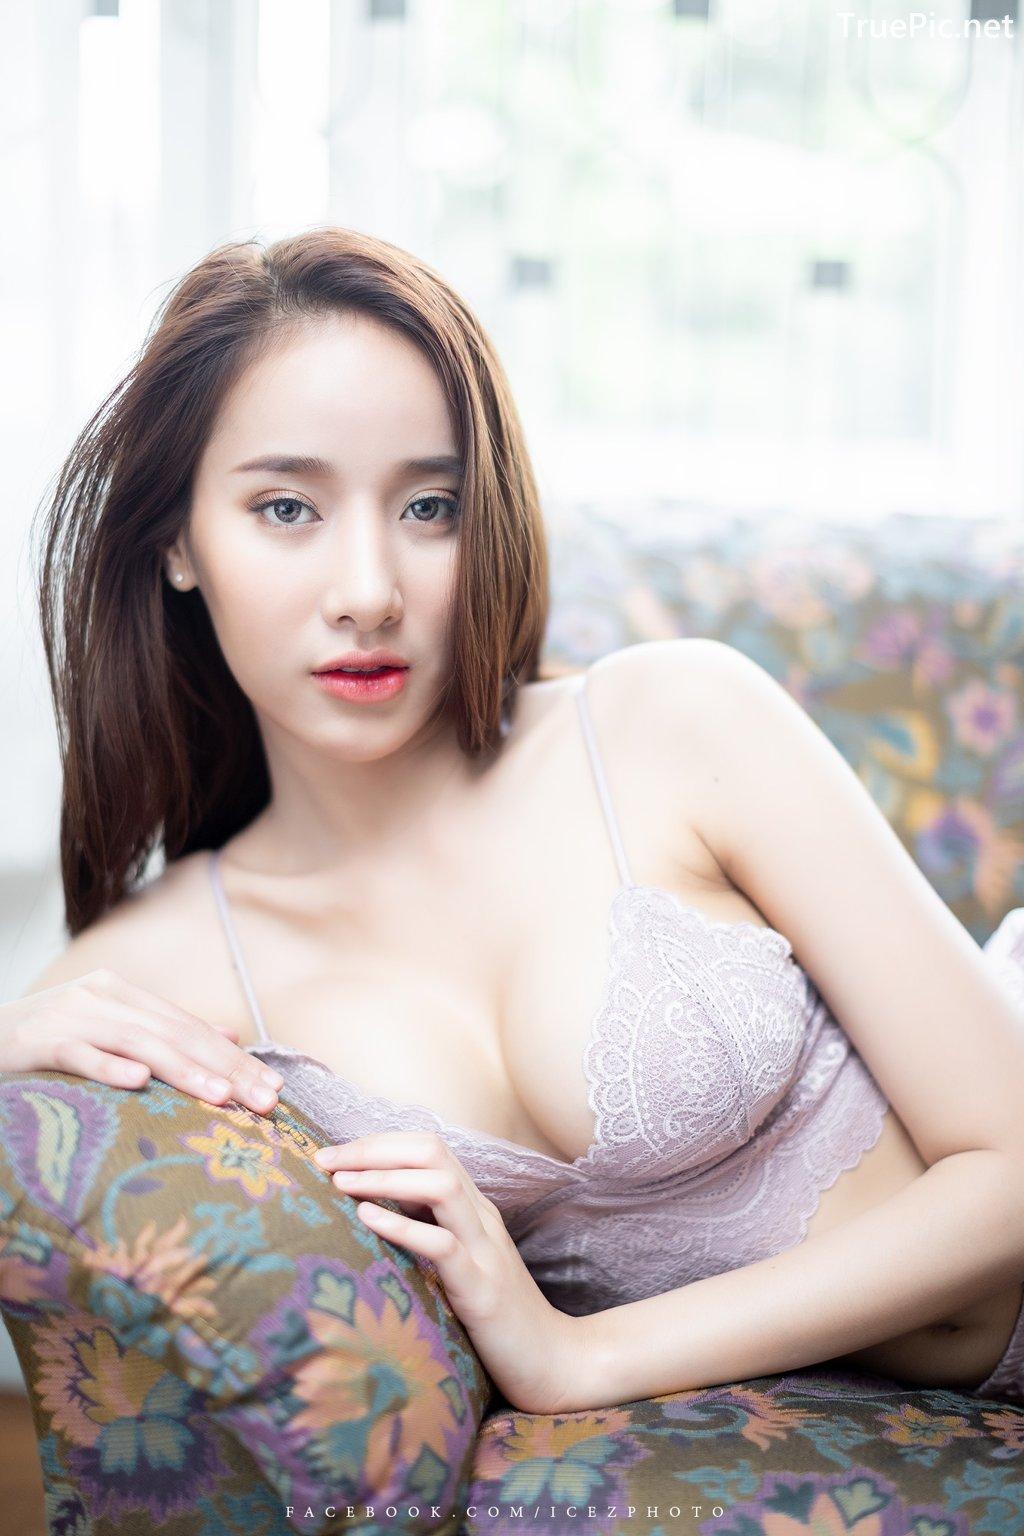 Image-Thailand-Hot-Model-Pichana-Yoosuk-Sexy-Purple-Bra-Shiny-Short-Pants-TruePic.net- Picture-4